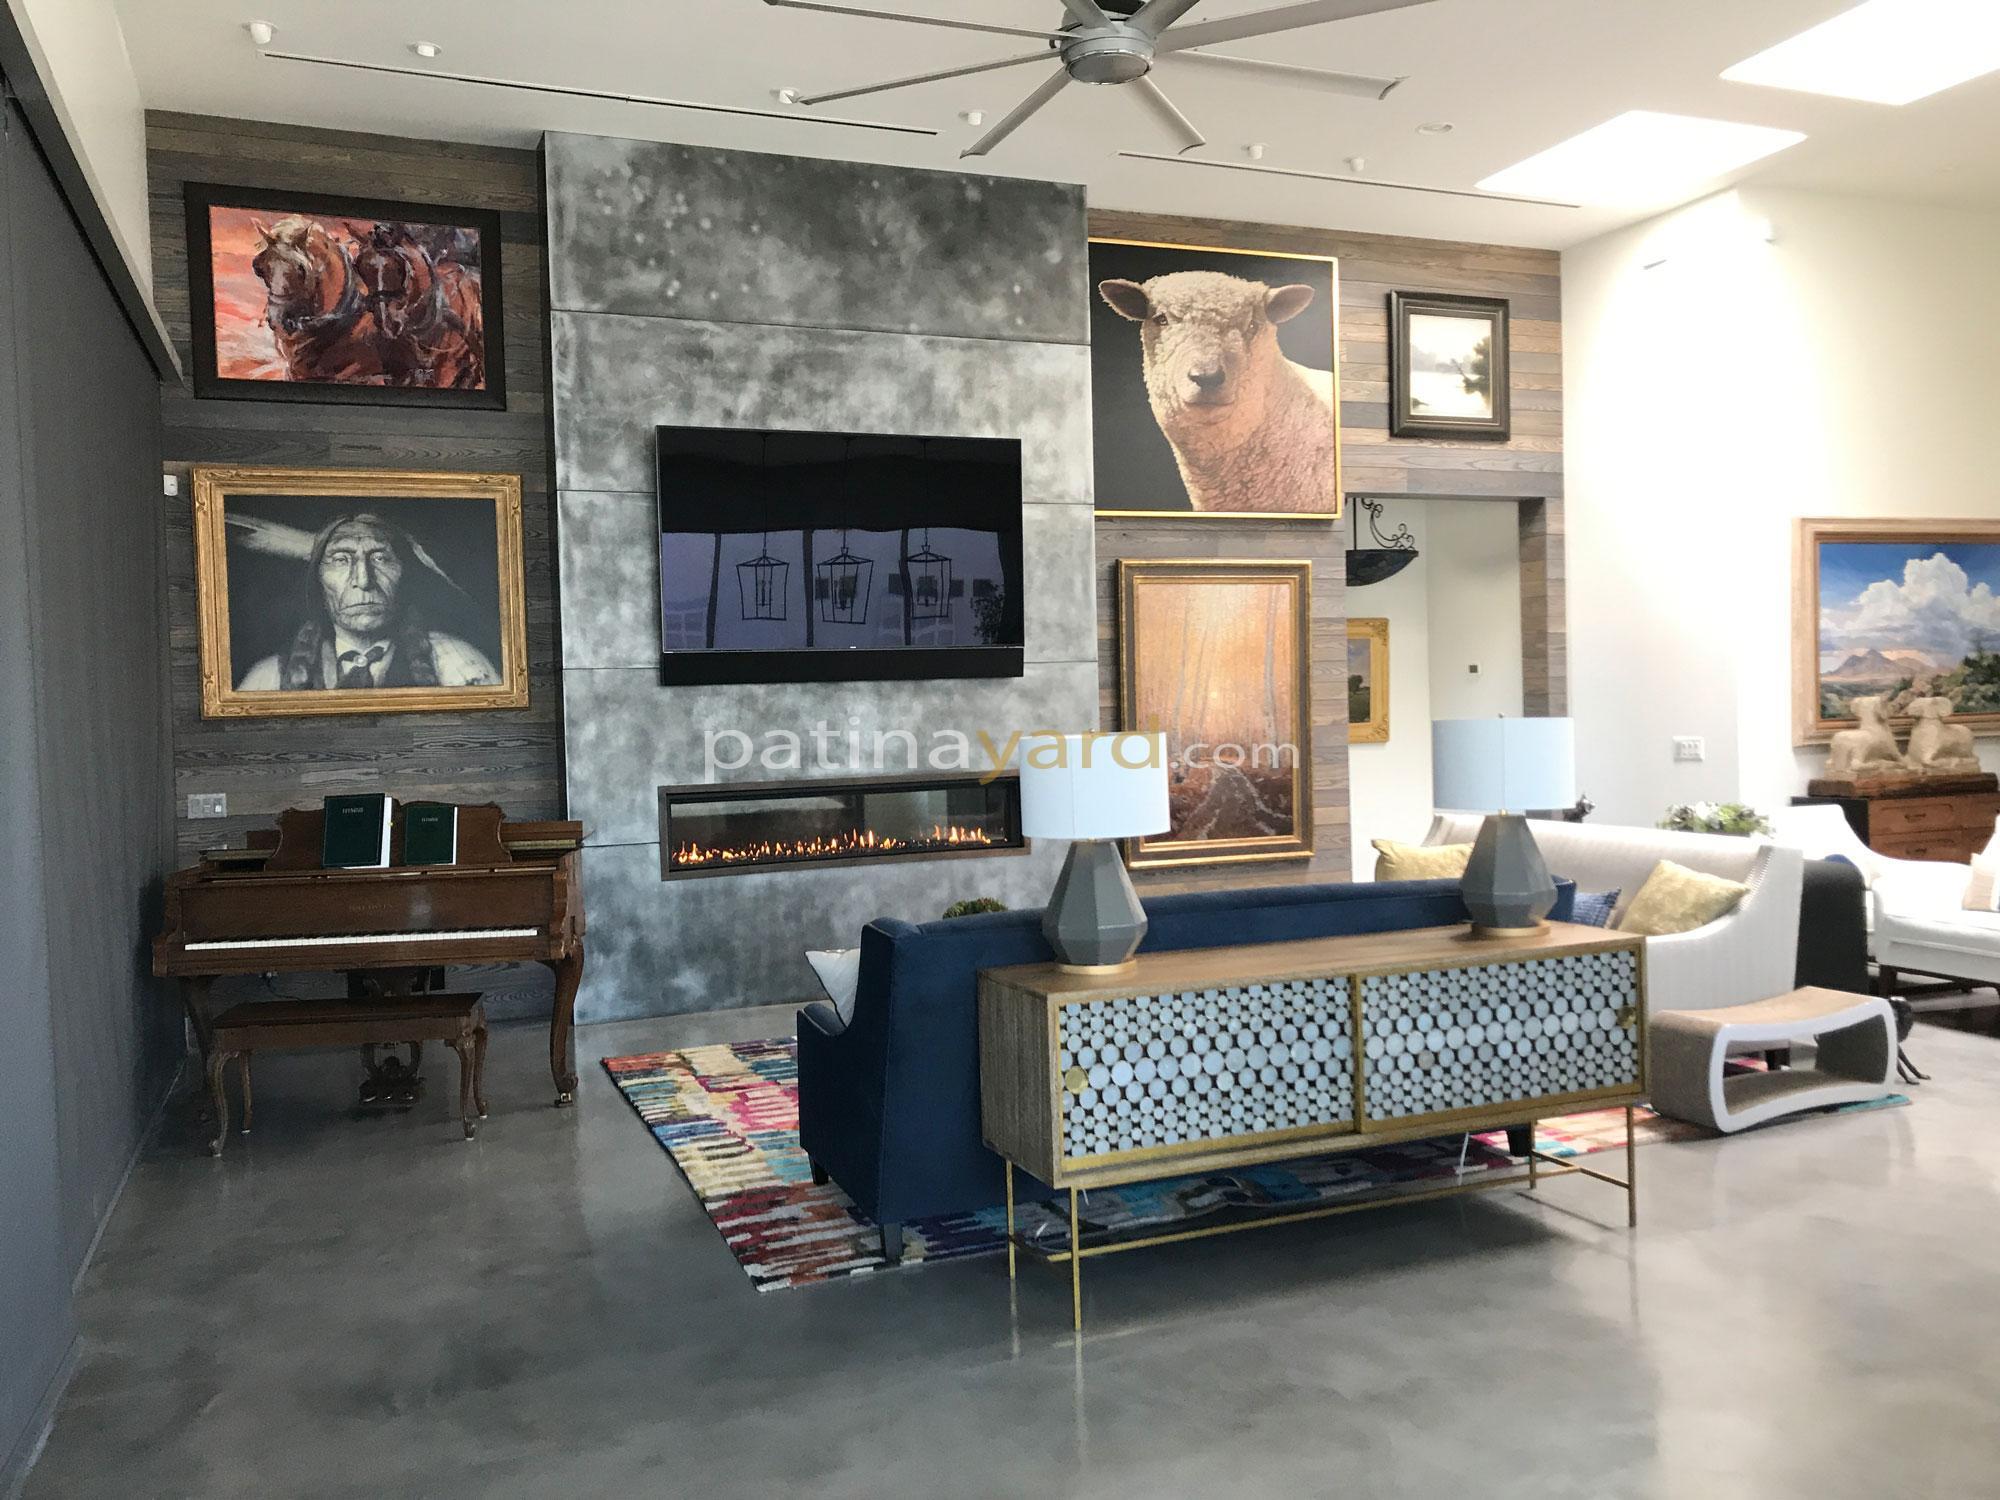 zinc metal fireplace surround and wood walls